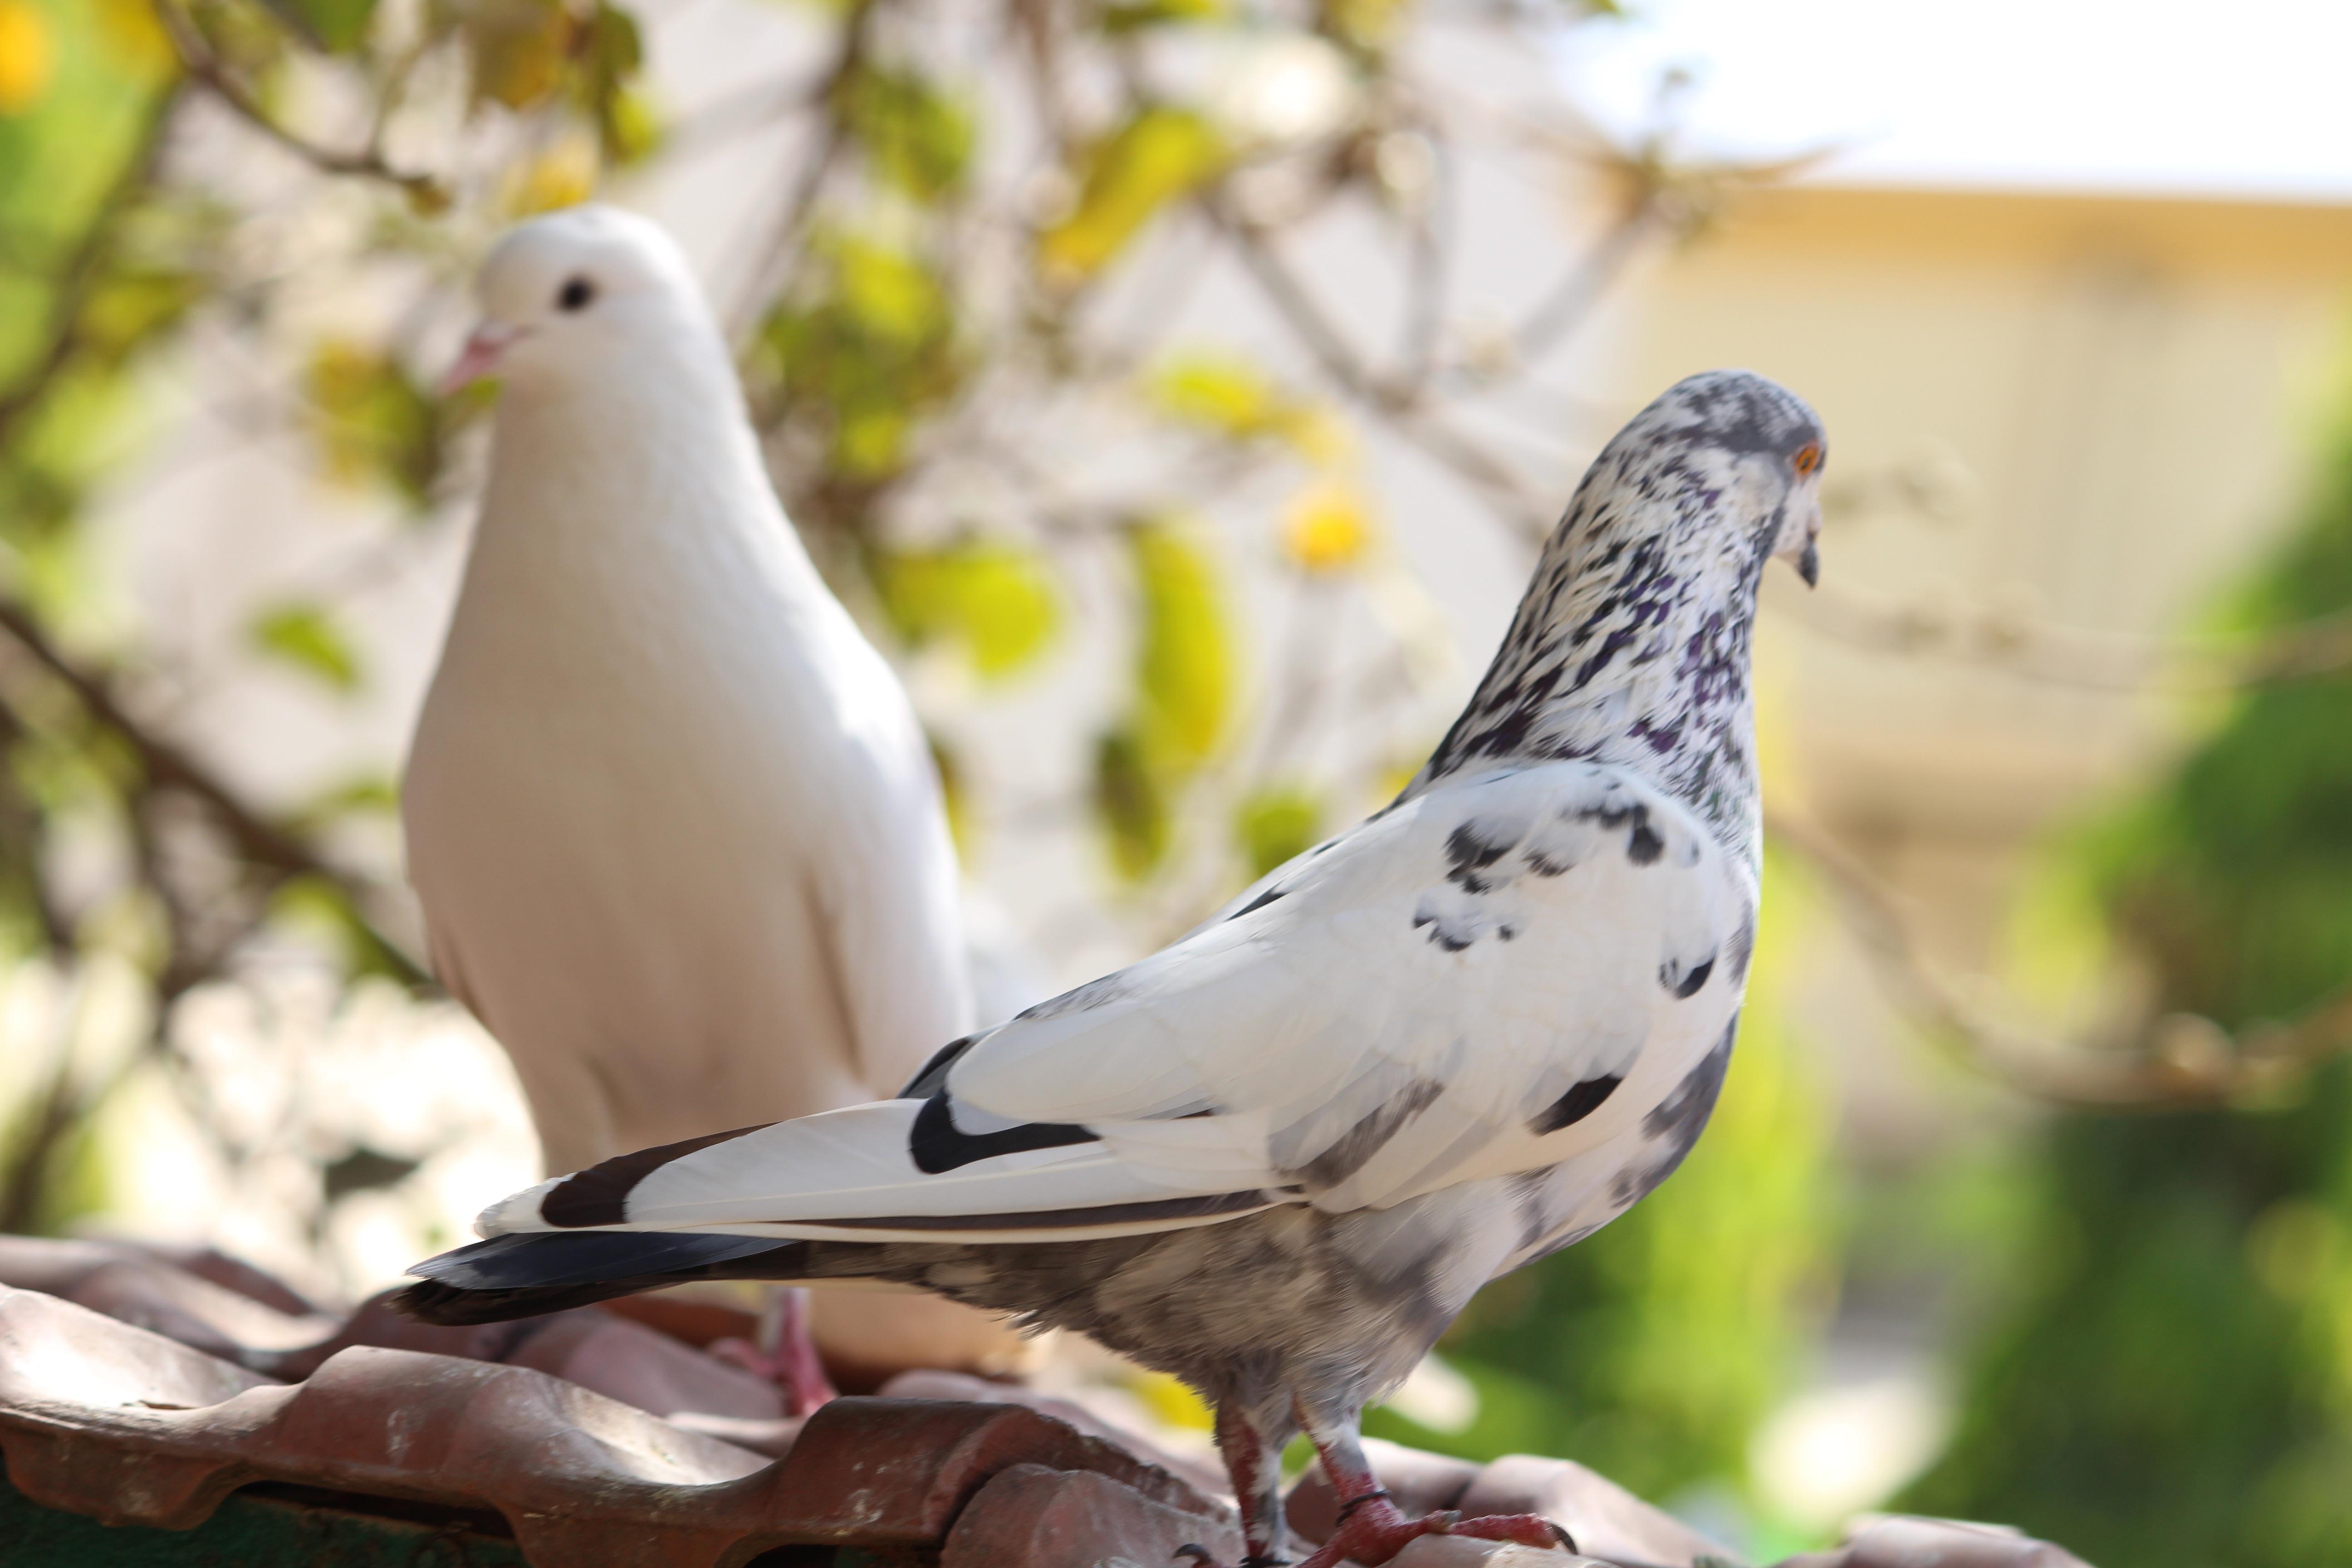 Gambar Cabang Margasatwa Paruh Fauna Bertulang Belakang Finch Bertengger Burung Merpati Dan Merpati Dove Saham Parkit Hewan Peliharaan Umum 5184x3456 88649 Galeri Foto Pxhere